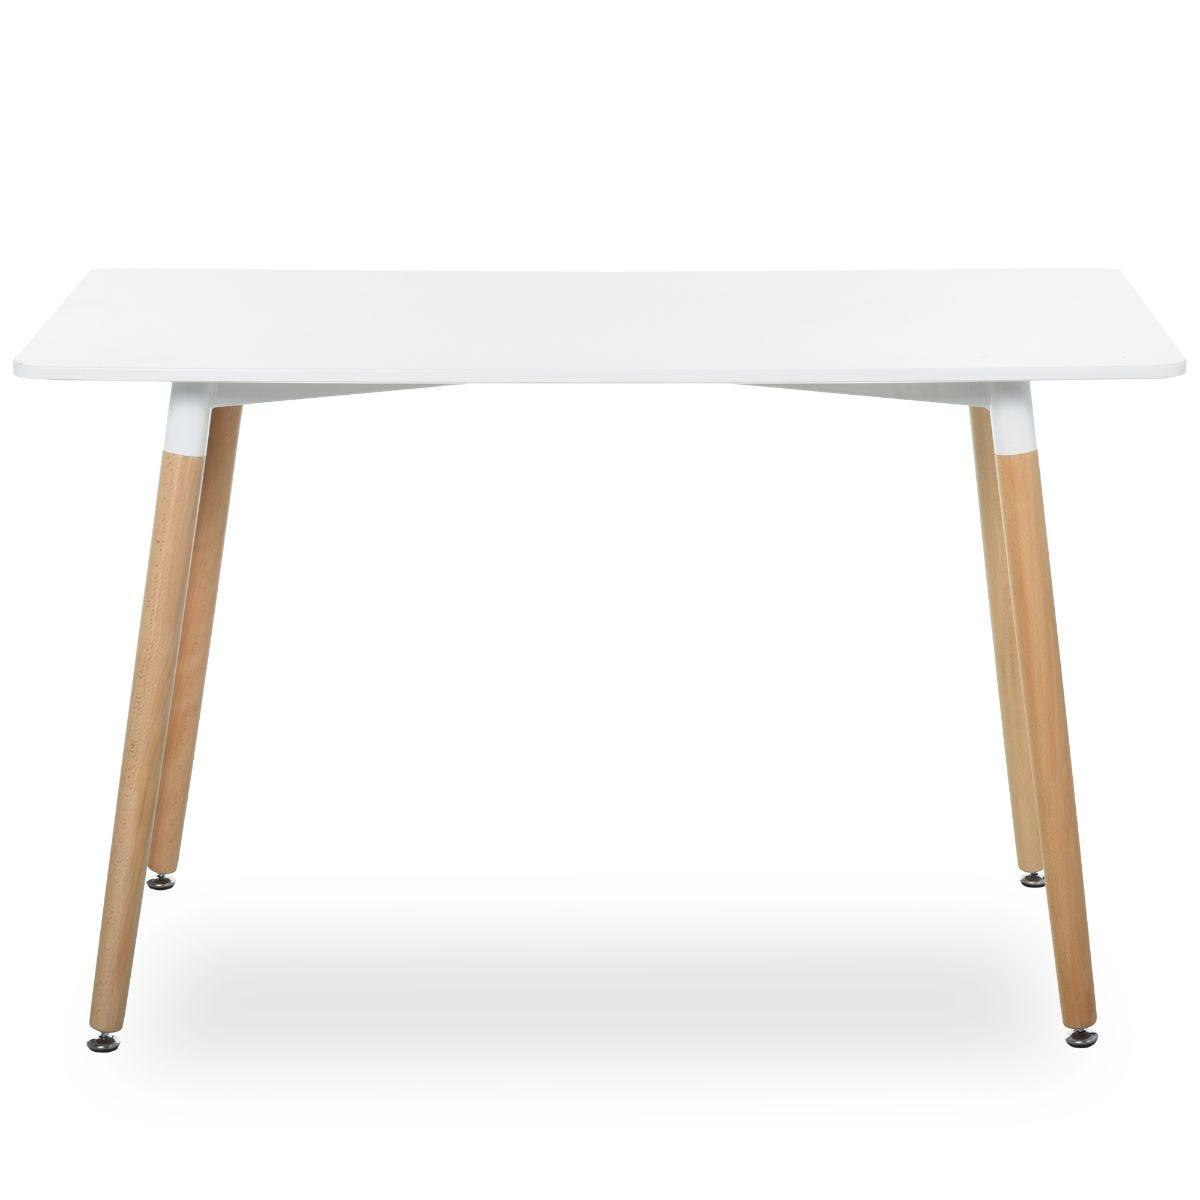 Scandinavian Style Dining Table Beech Wood Legs Adjustable Feet White